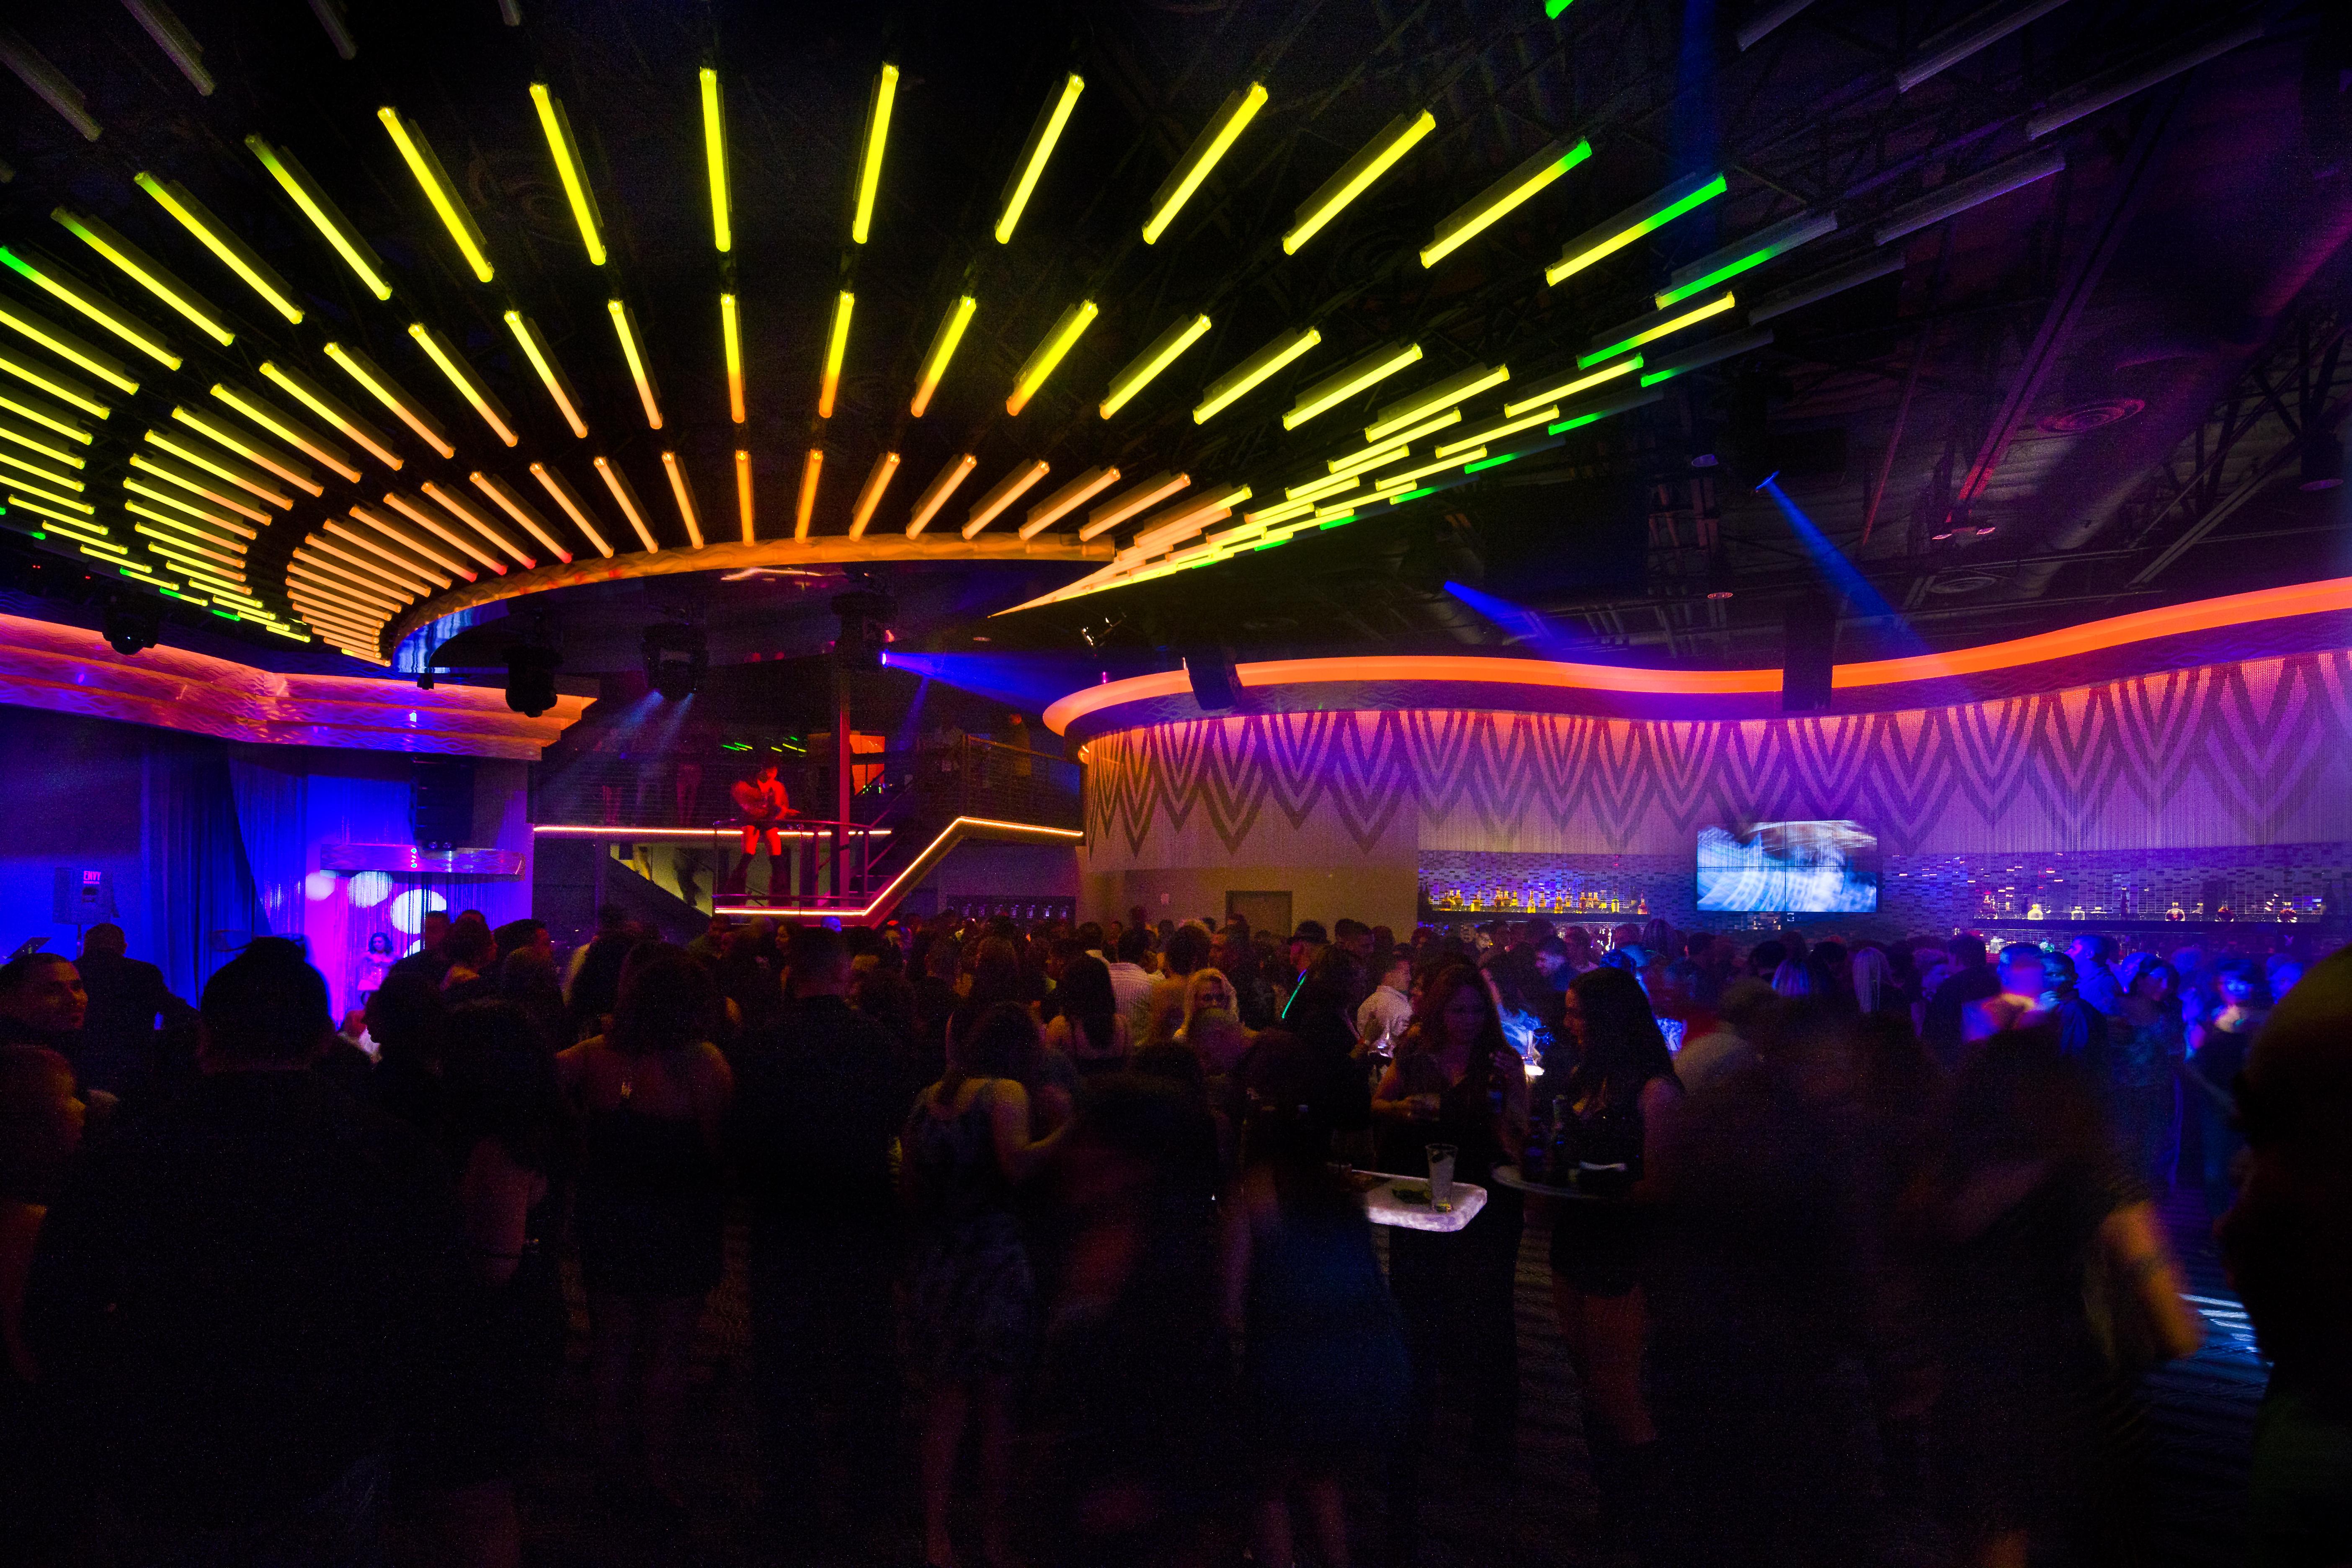 Pinterest the world s catalog of ideas - Licht nightclub ...